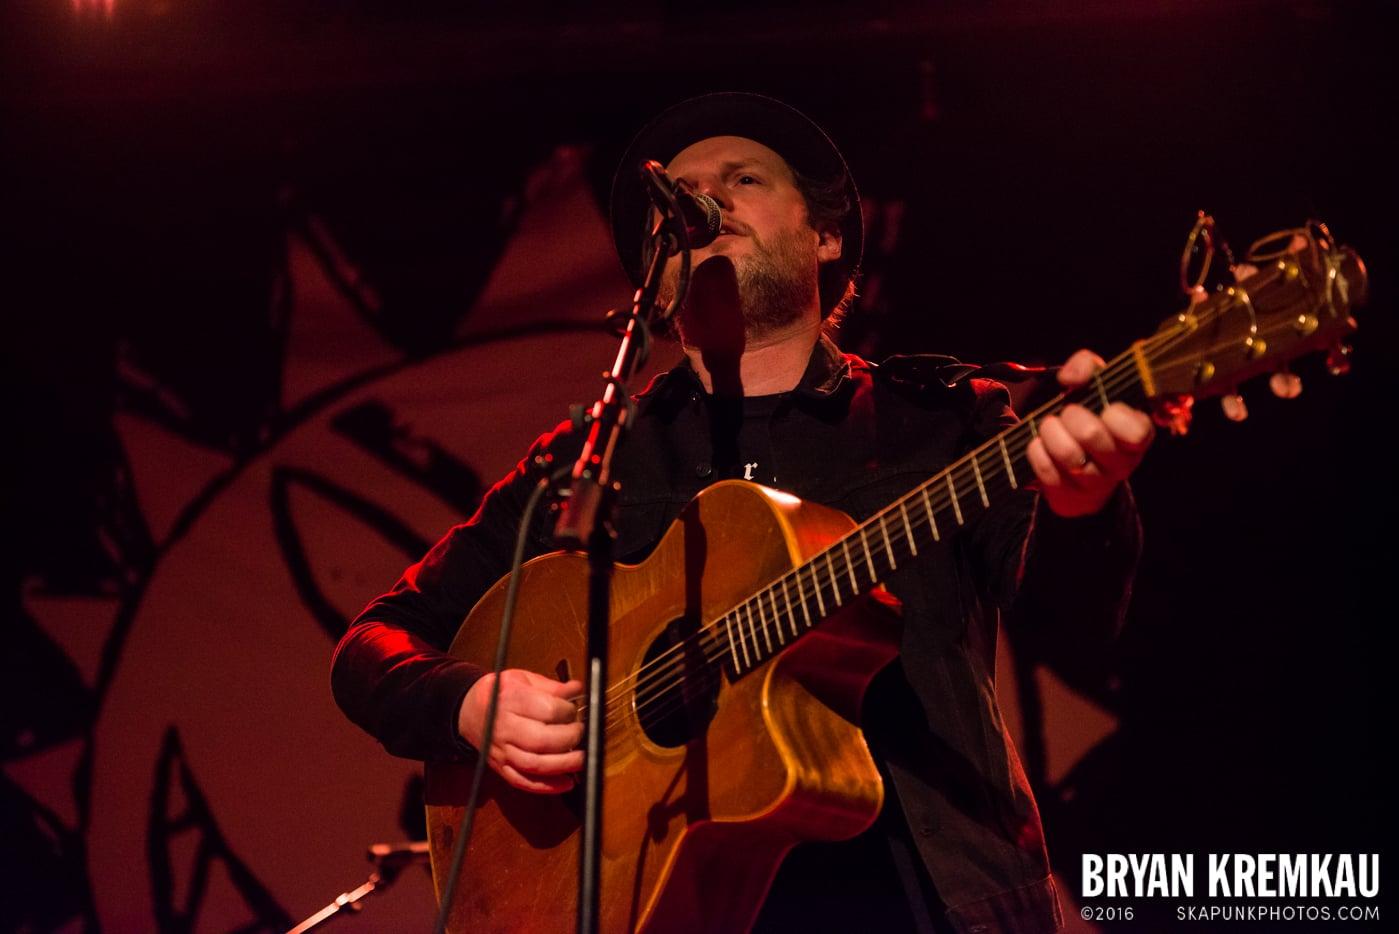 Casey Neill @ Music Hall of Williamsburg, Brooklyn, NY - 9.25.16 (8)